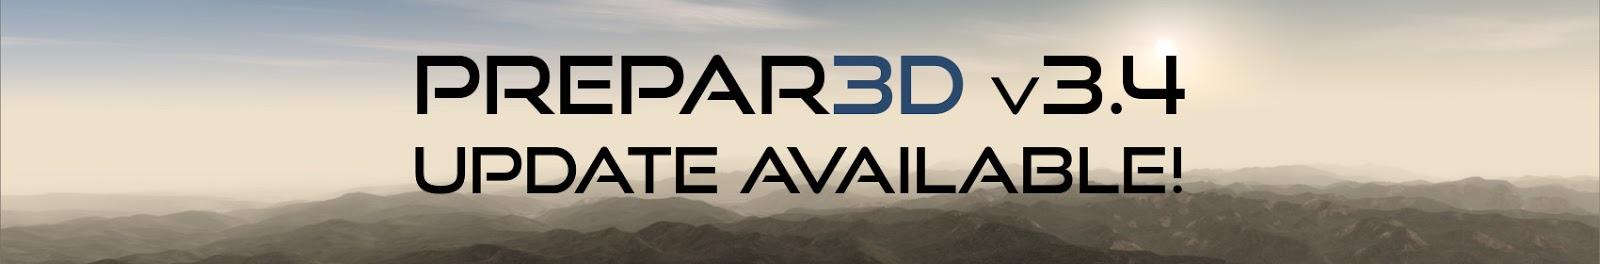 P3D] Prepar3d v3 4 9 patches only + FSUIPC 4 957 - Master Addons